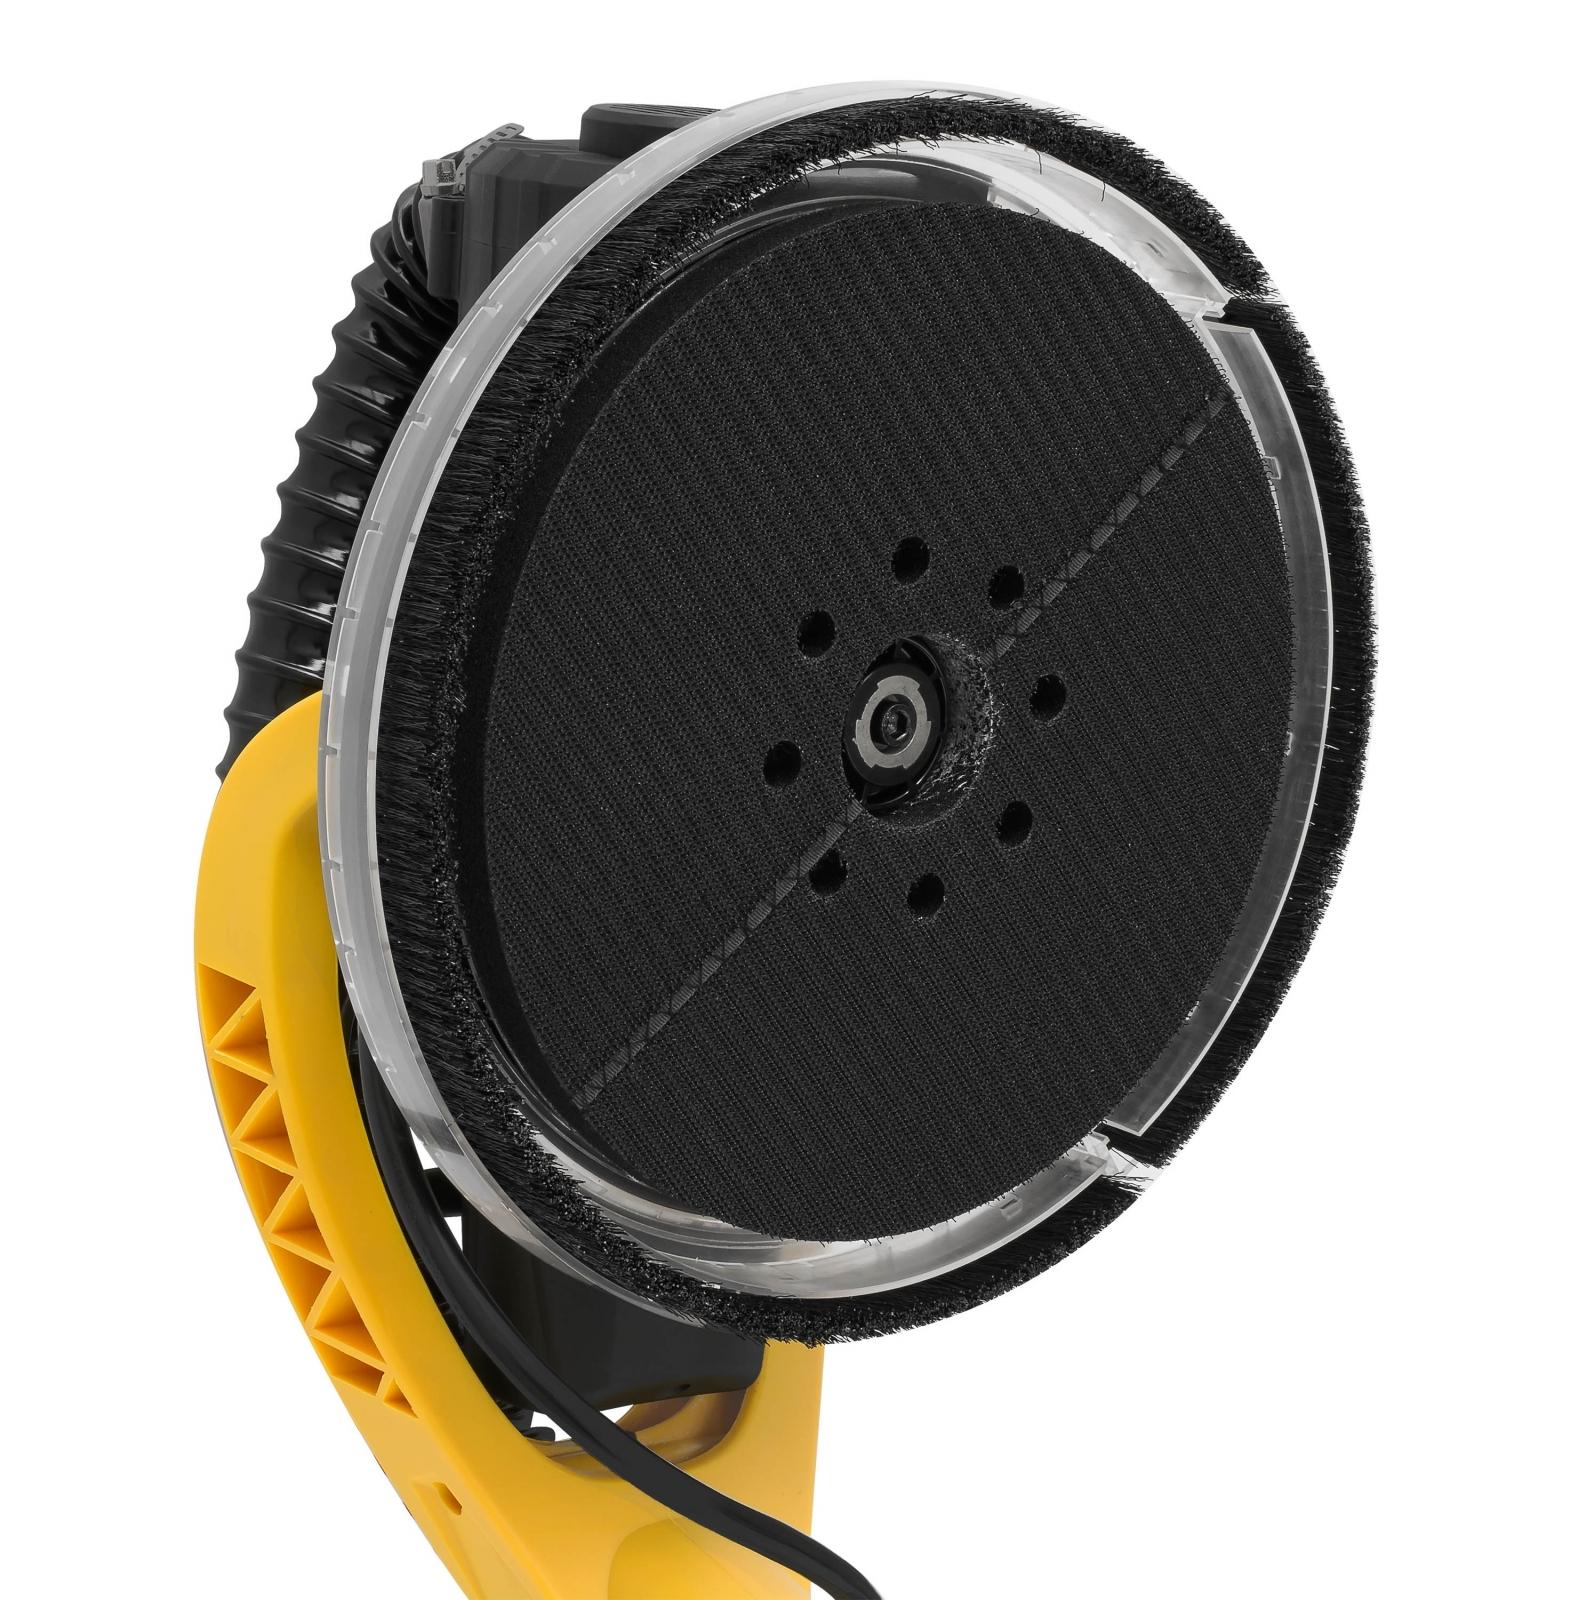 Lixadeira De Parede E Teto Telescópica 750w Wagner Lw2 - Ferramentas MEP